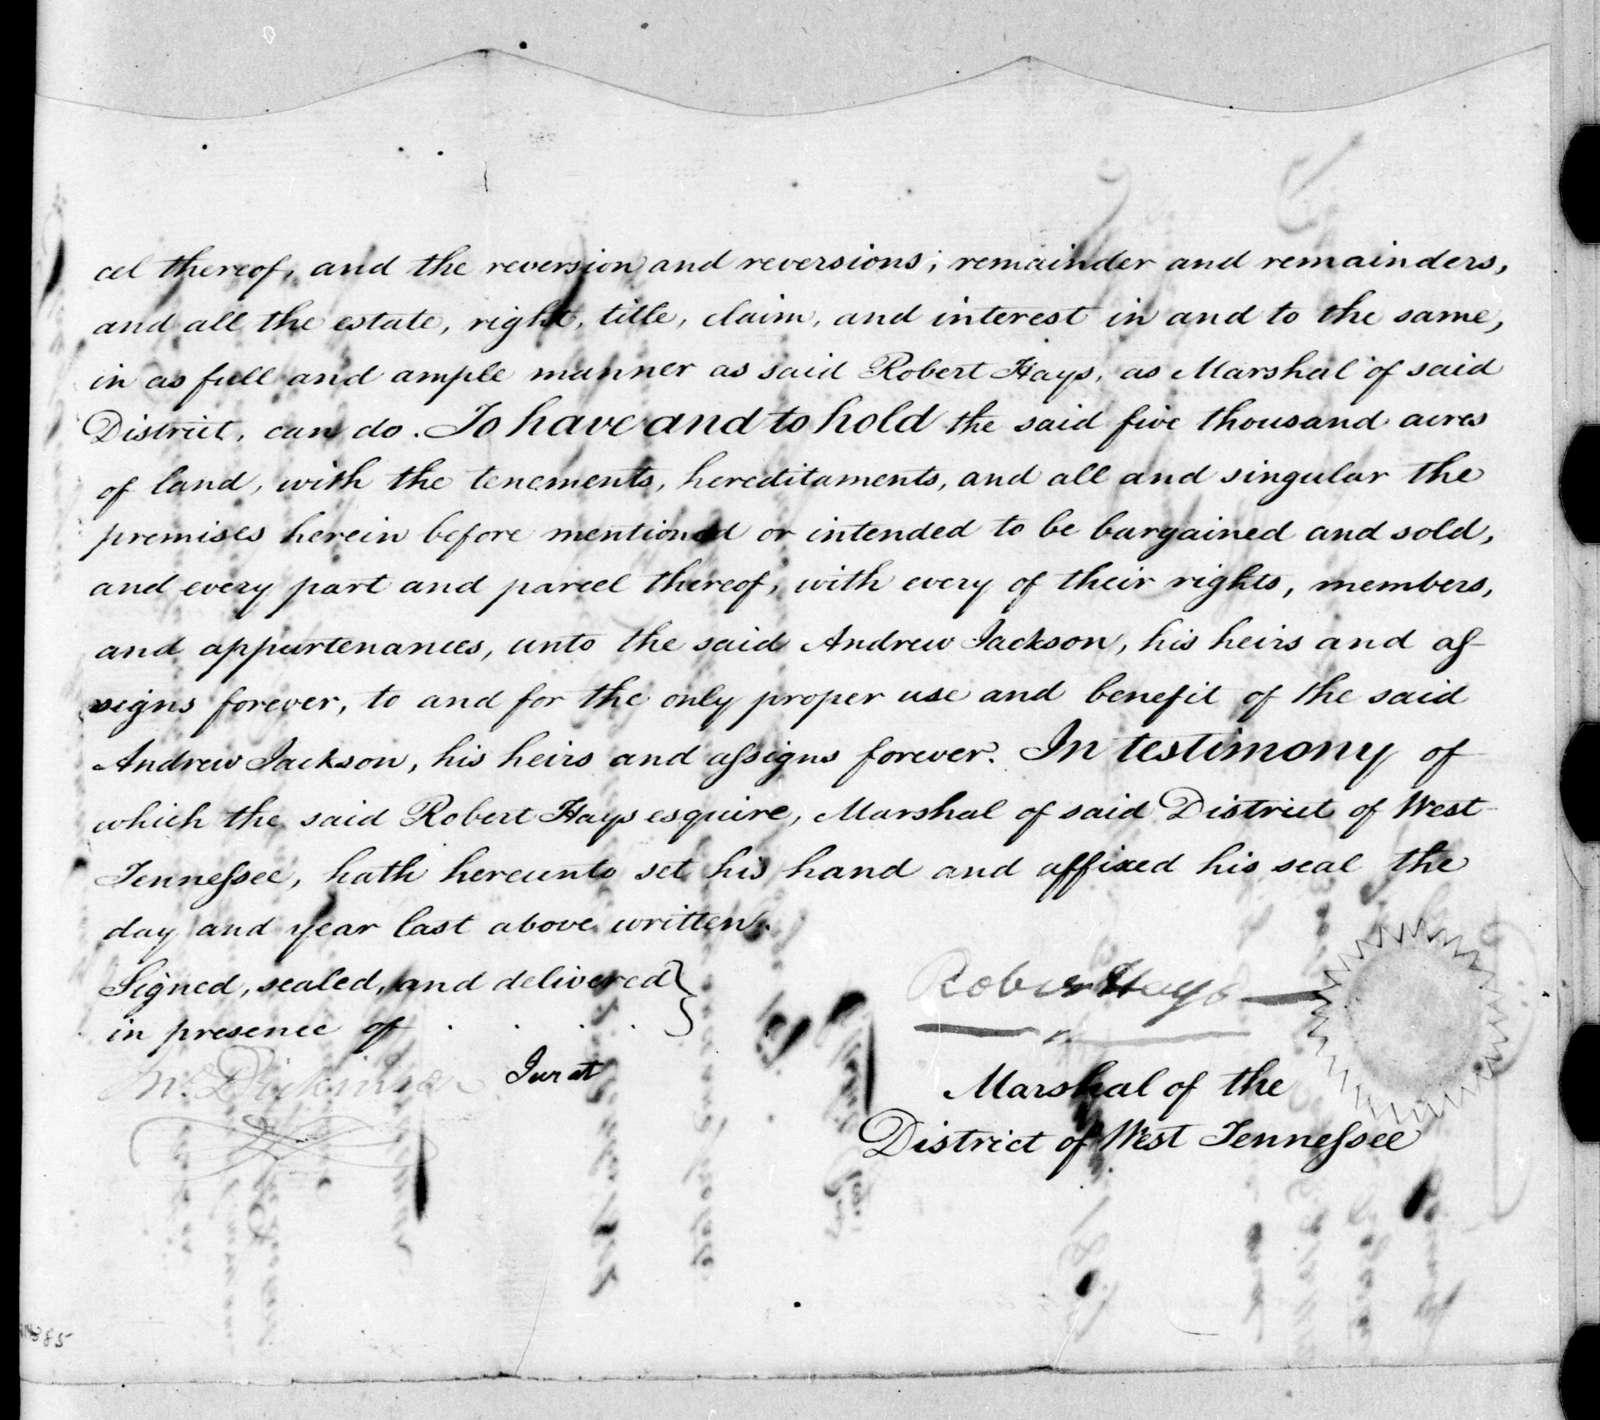 Robert Hays to Andrew Jackson, July 13, 1802